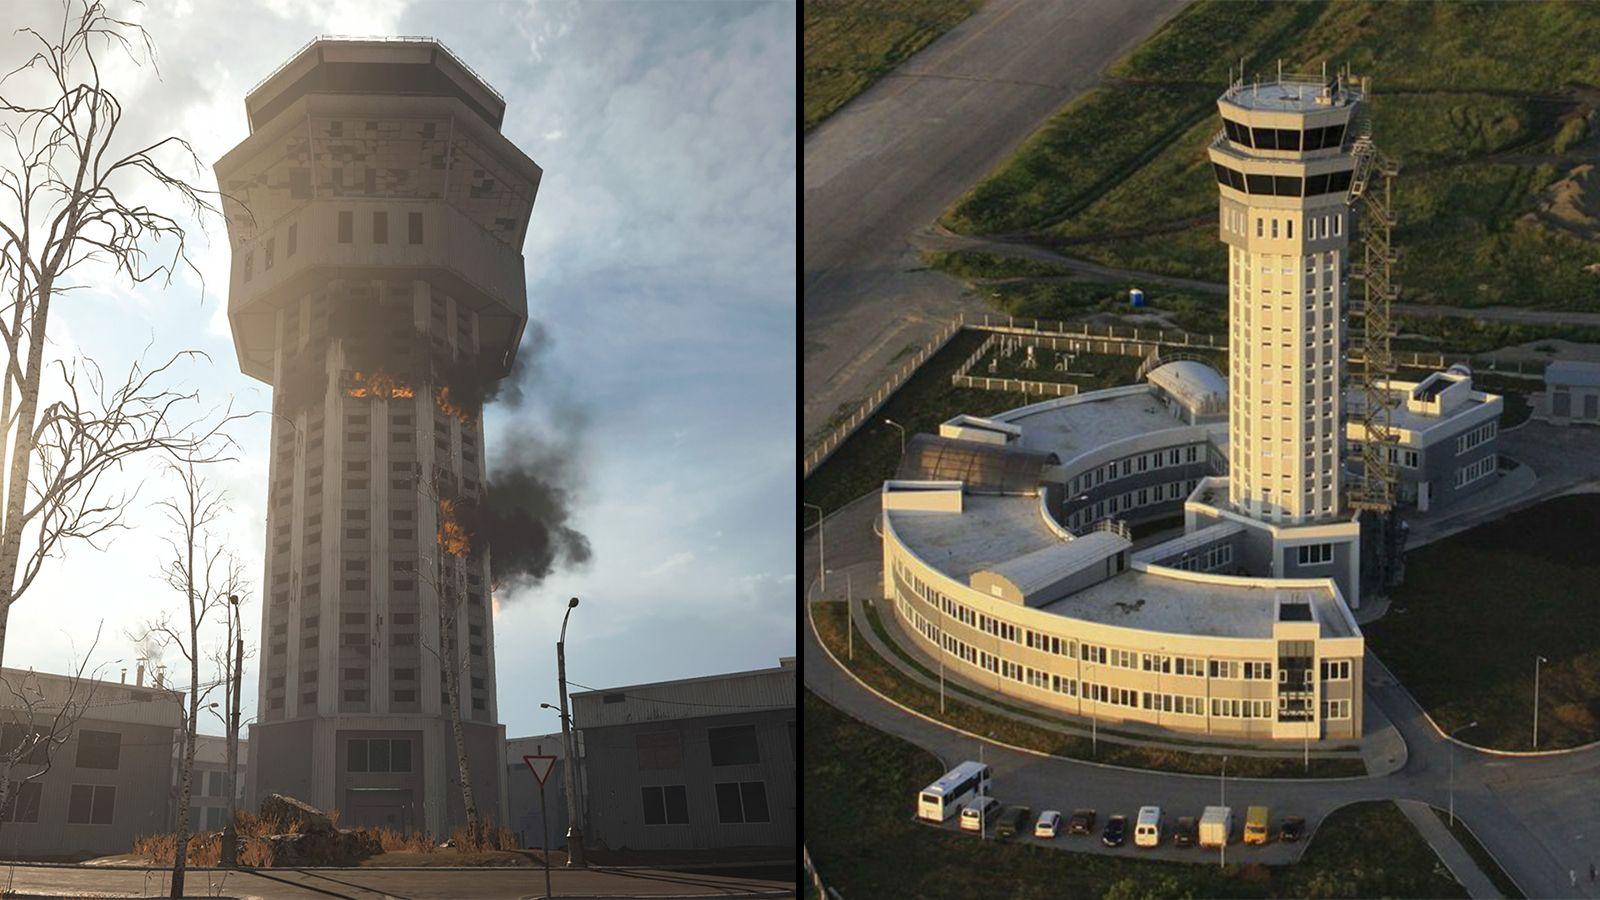 aéroport Verdansk Warzone   Aéroport Donetsk Ukraine